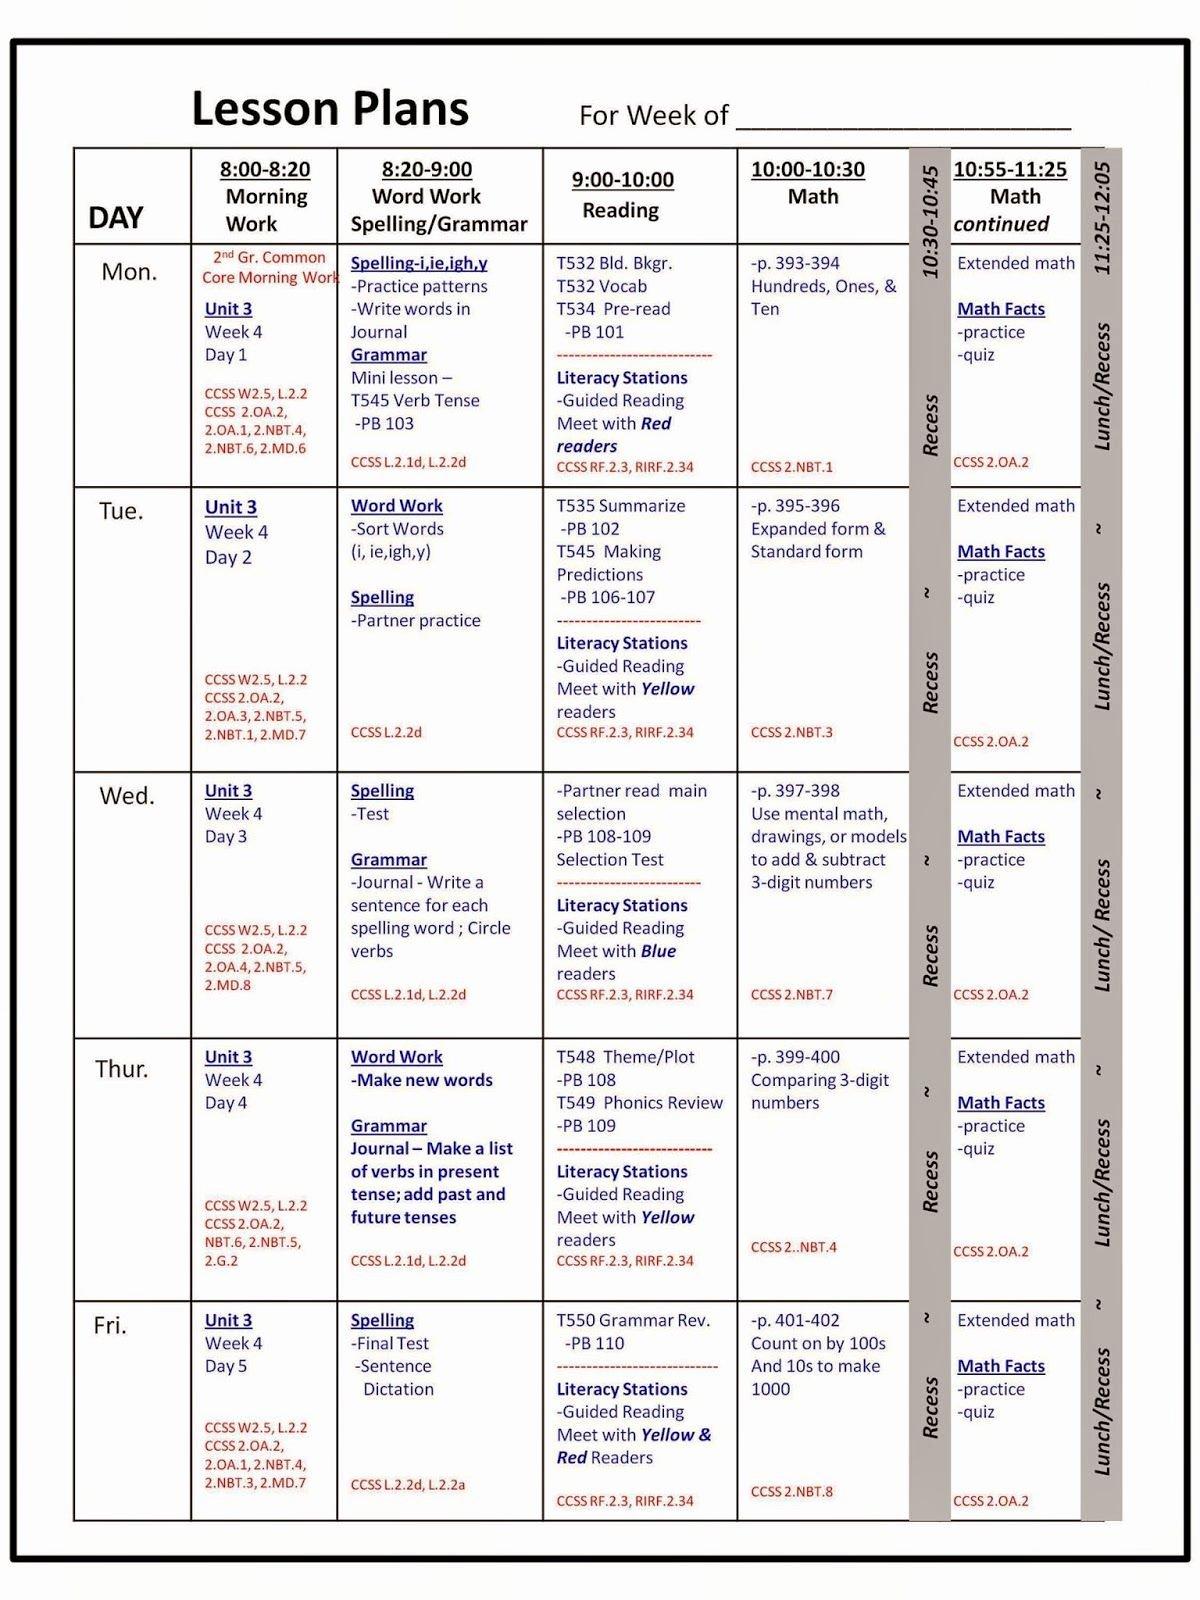 Lesson Planning Idea